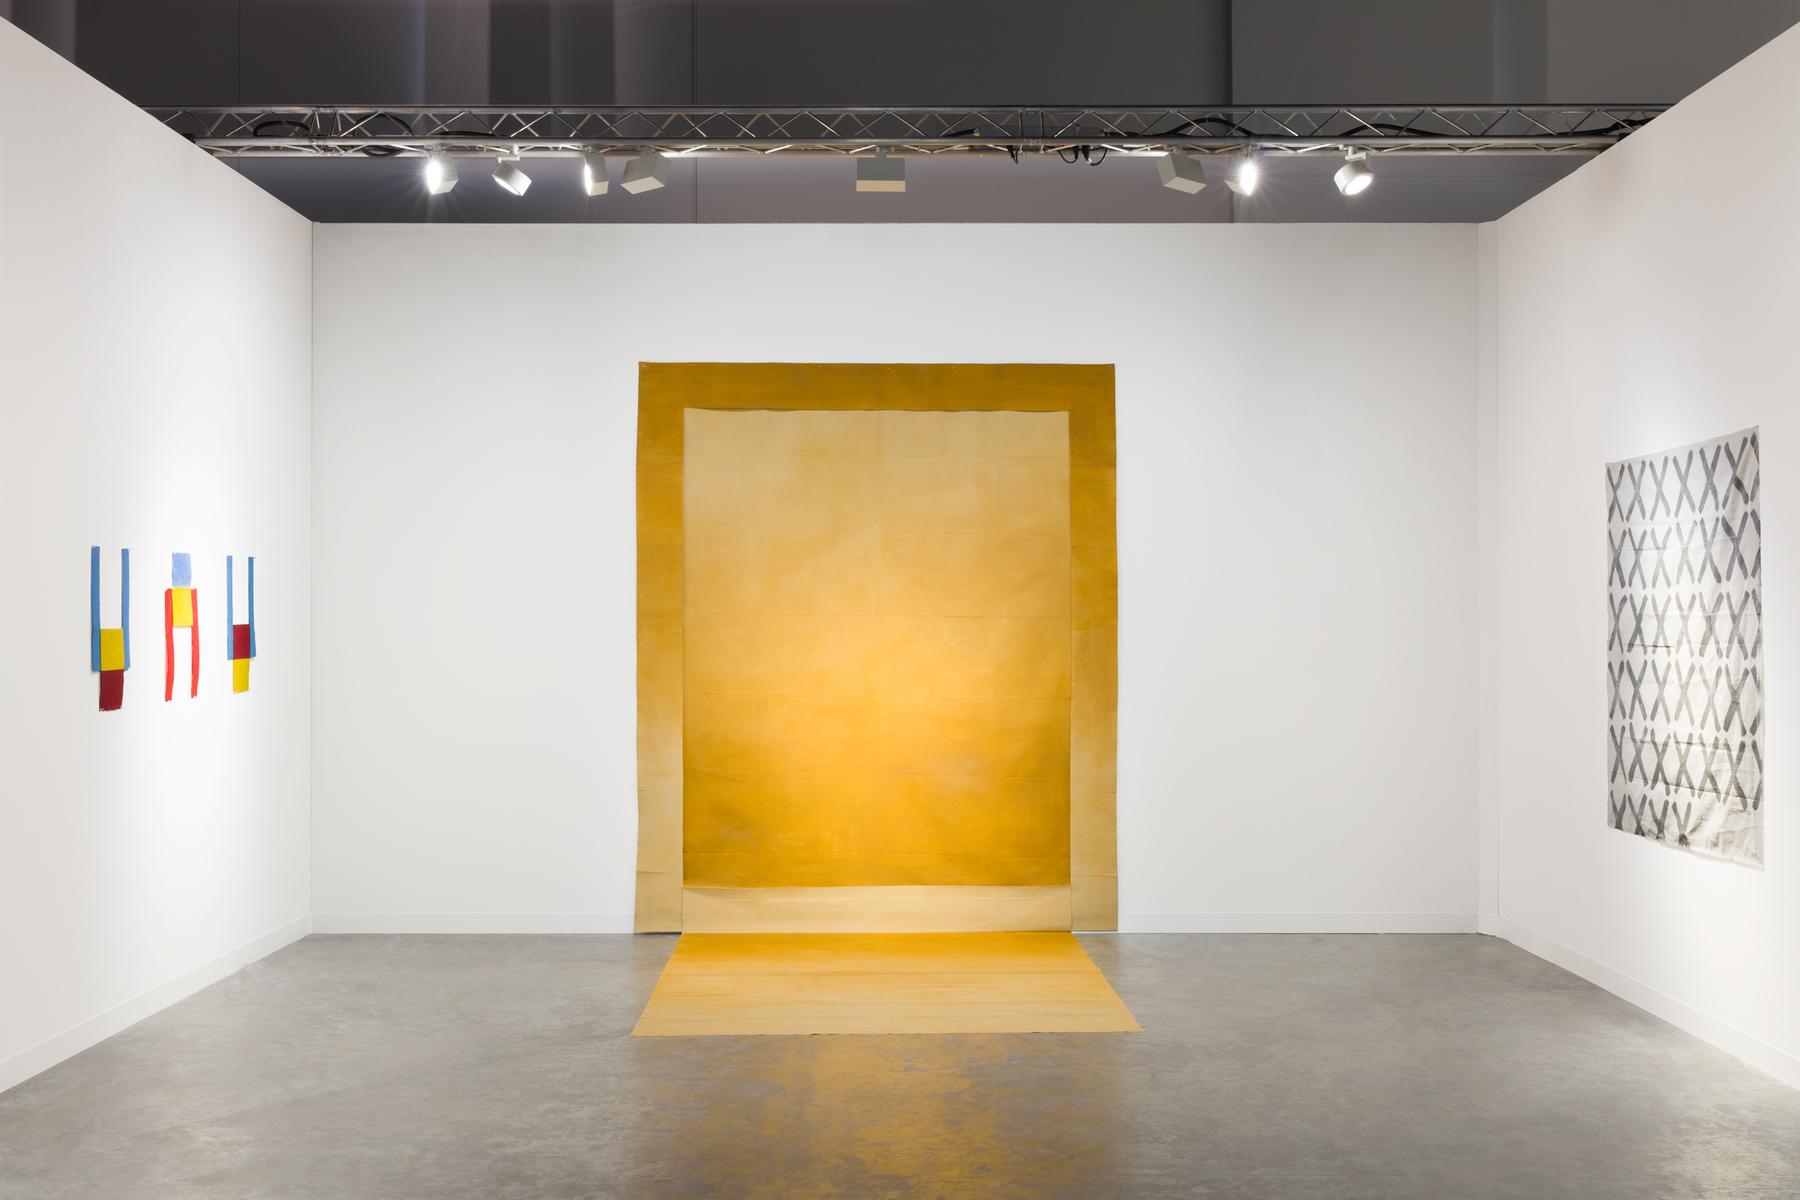 3_Art Basel Miami Beac 2018 70